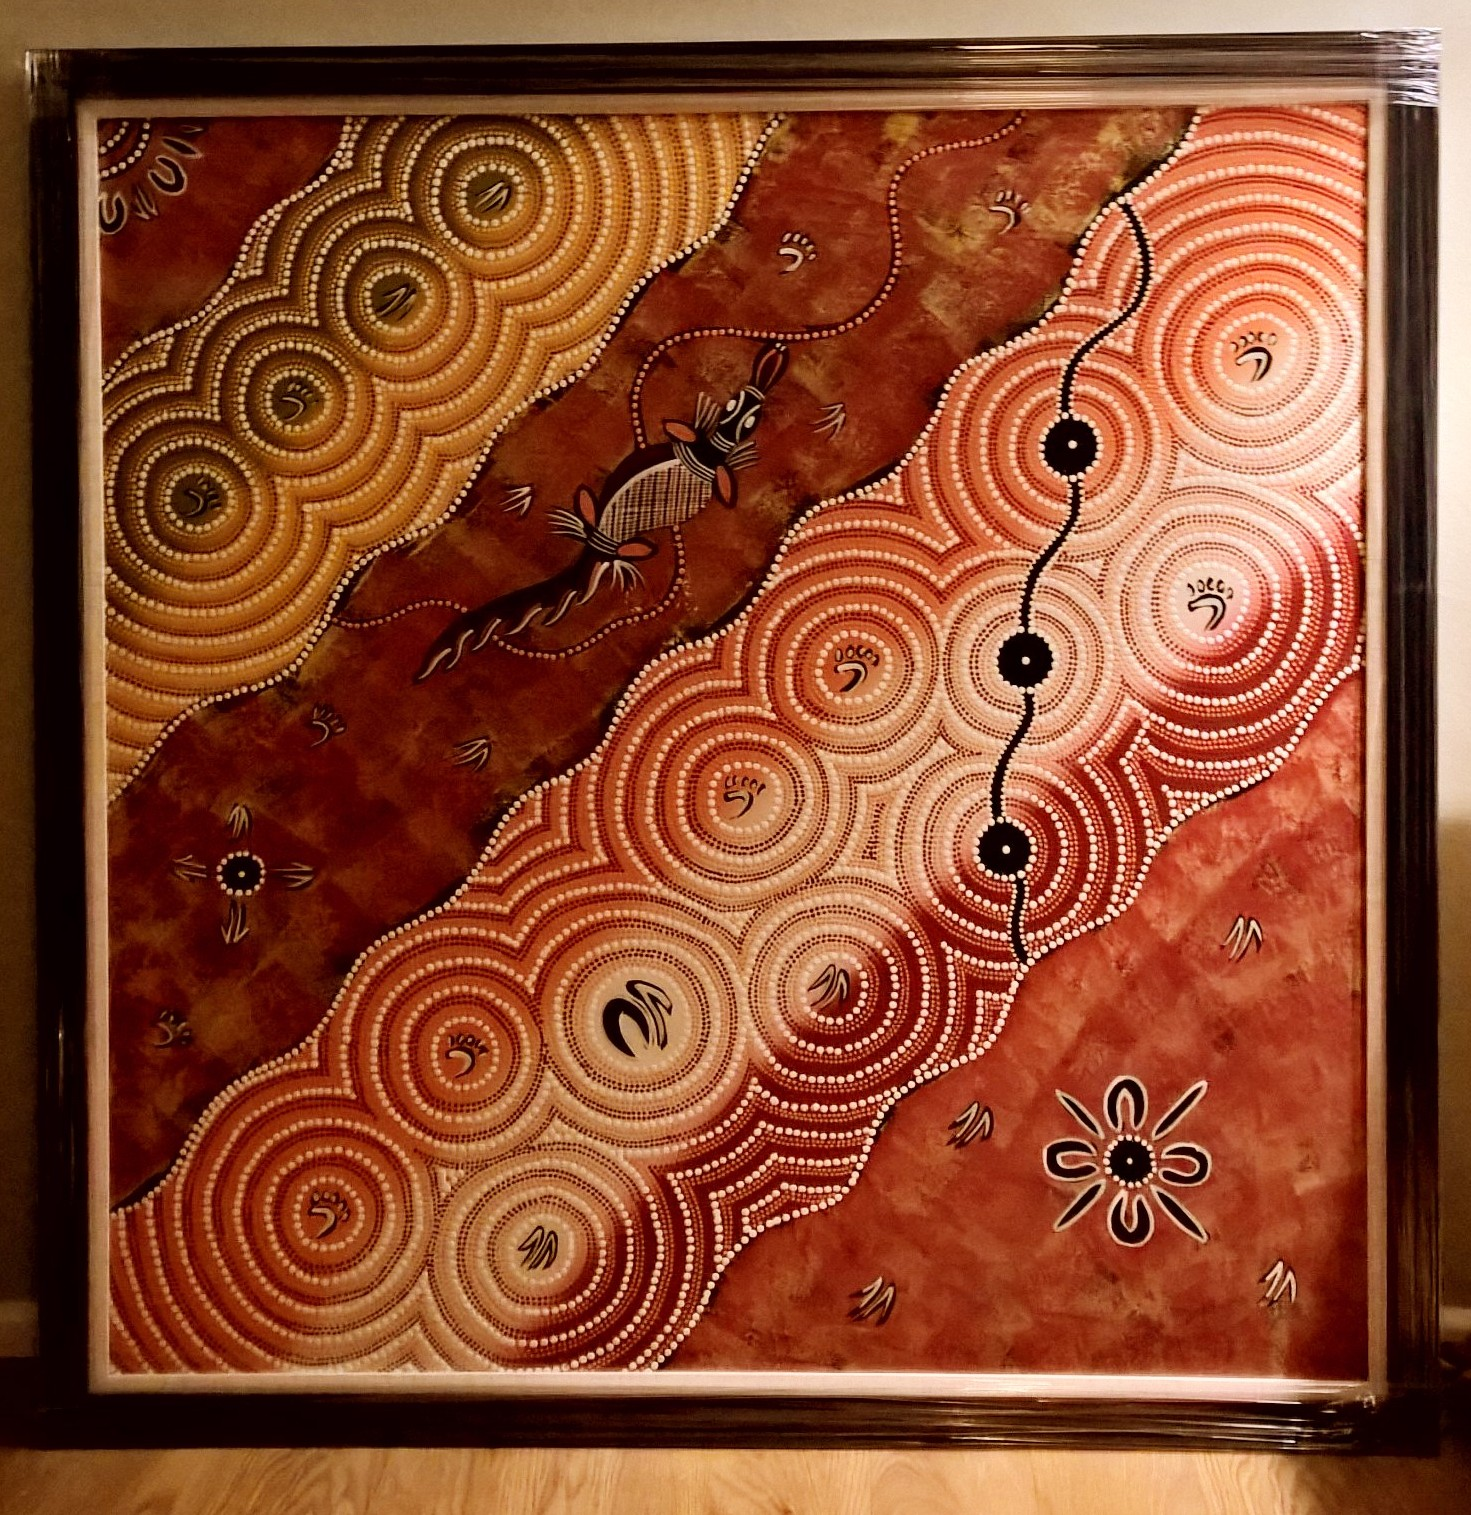 1700x1700 Aboriginal Dot Art05_22_11_44_Pro